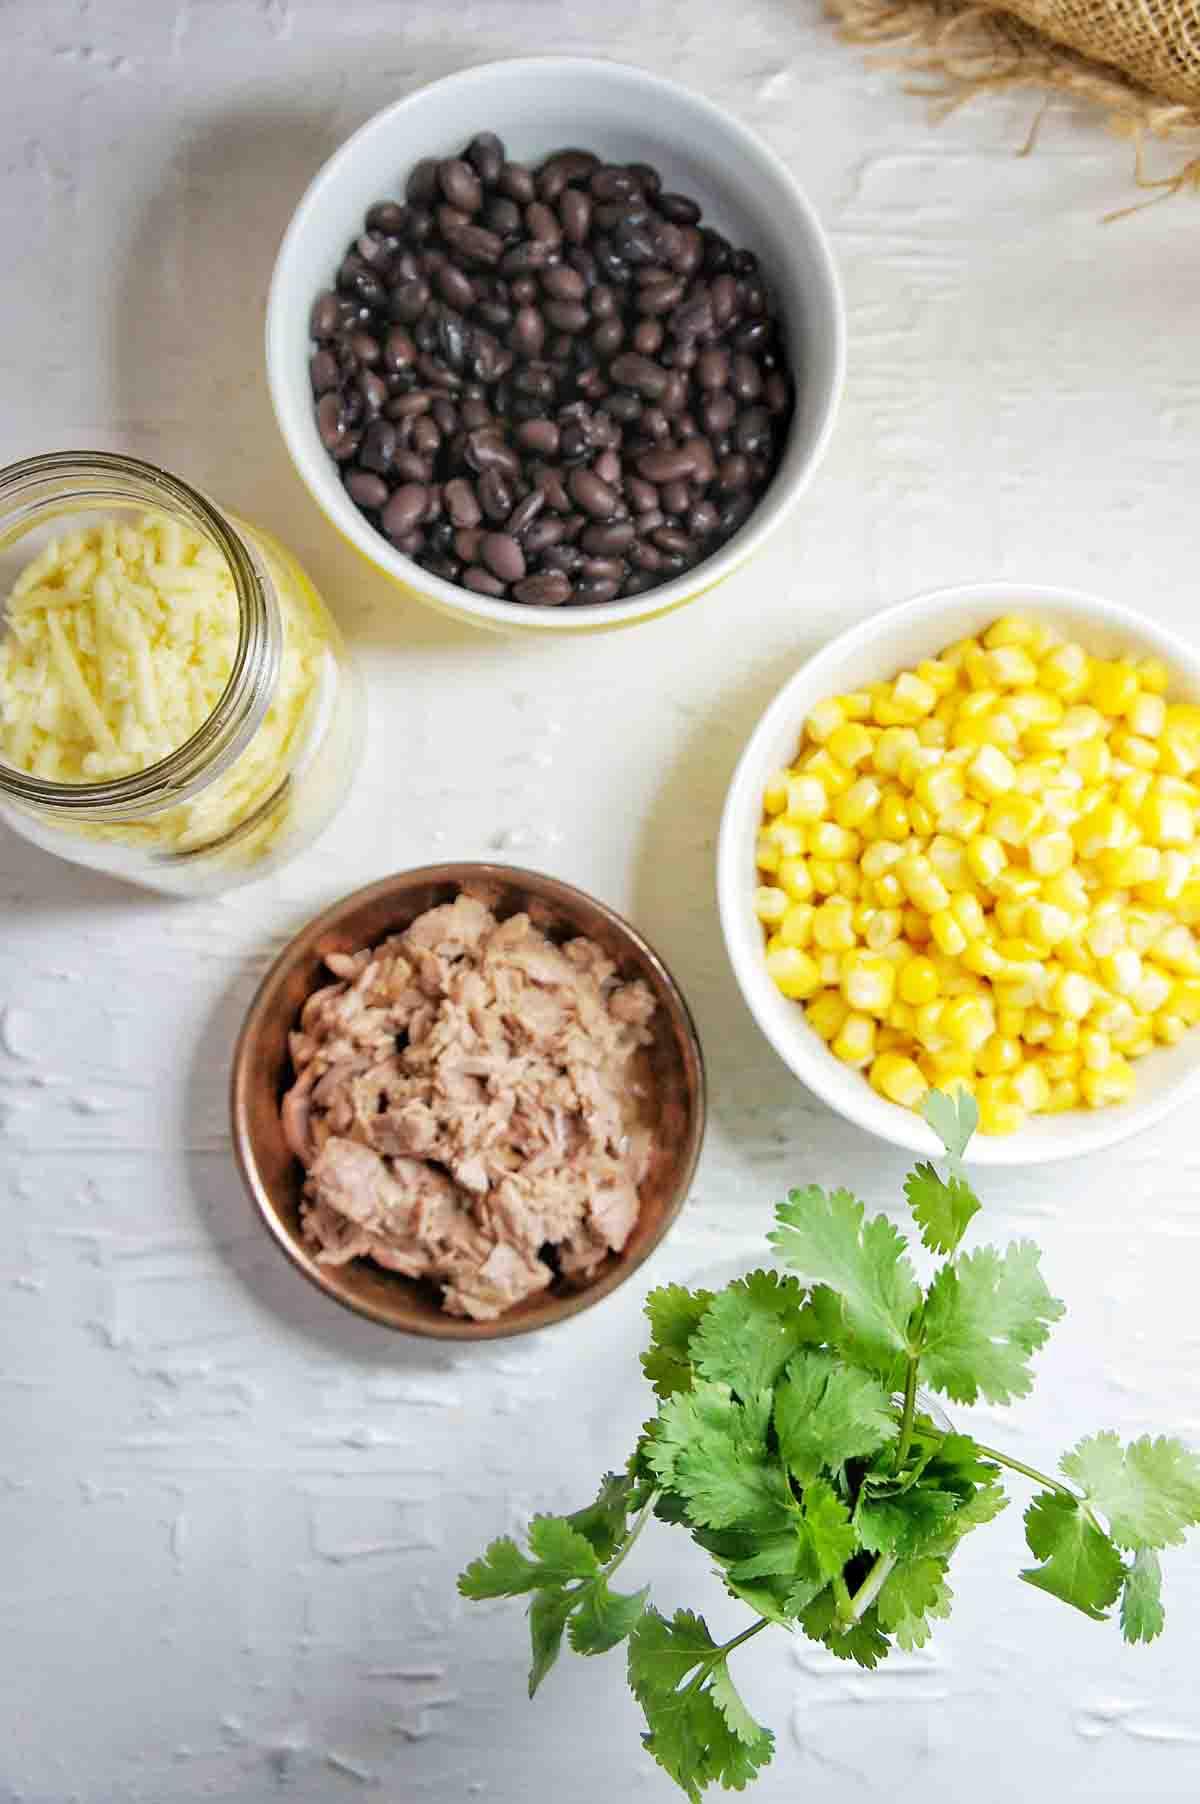 Ingredients for Fiesta Tuna Pasta Bake Recipe